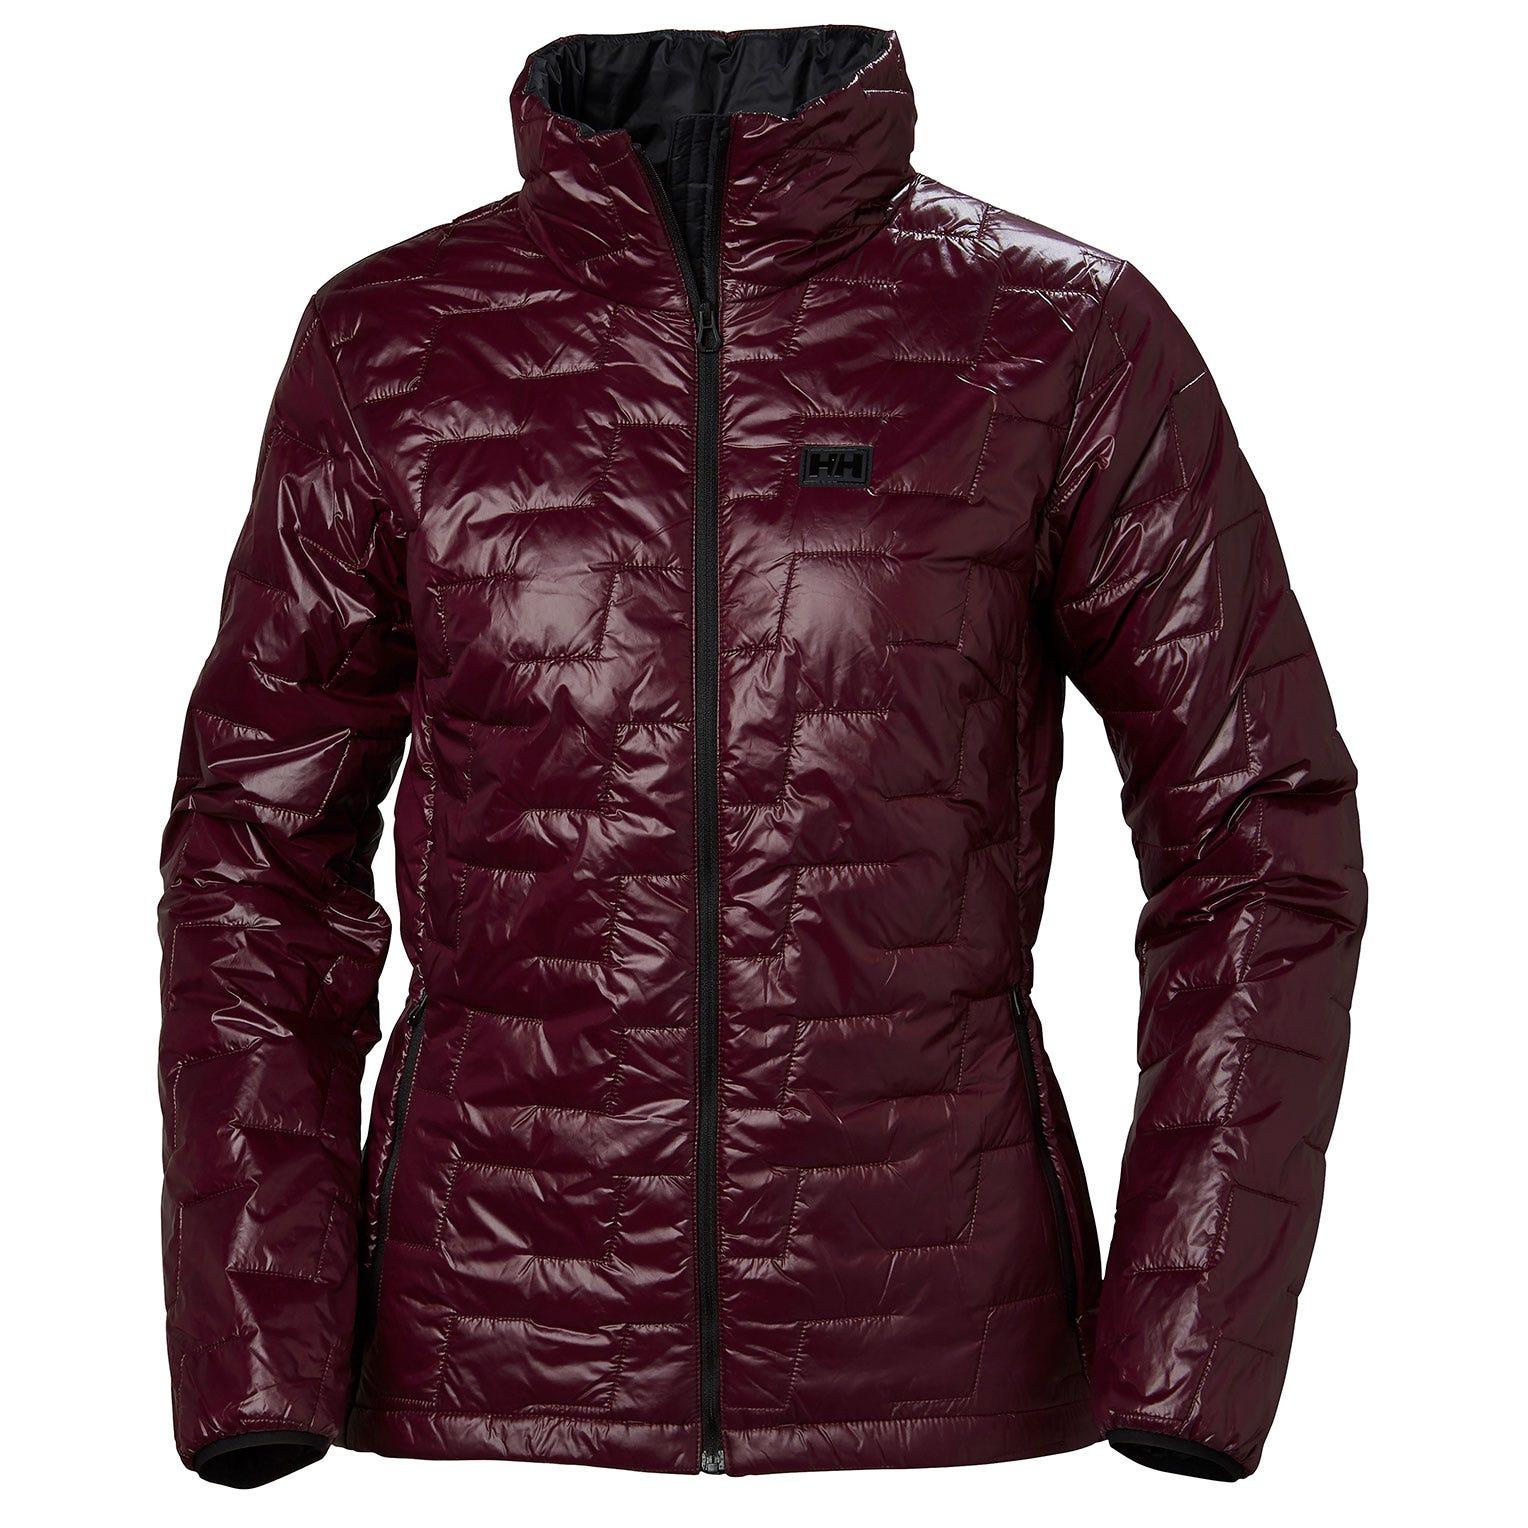 Helly Hansen Womens Lifaloft Insulator Jacket Fleece Purple S